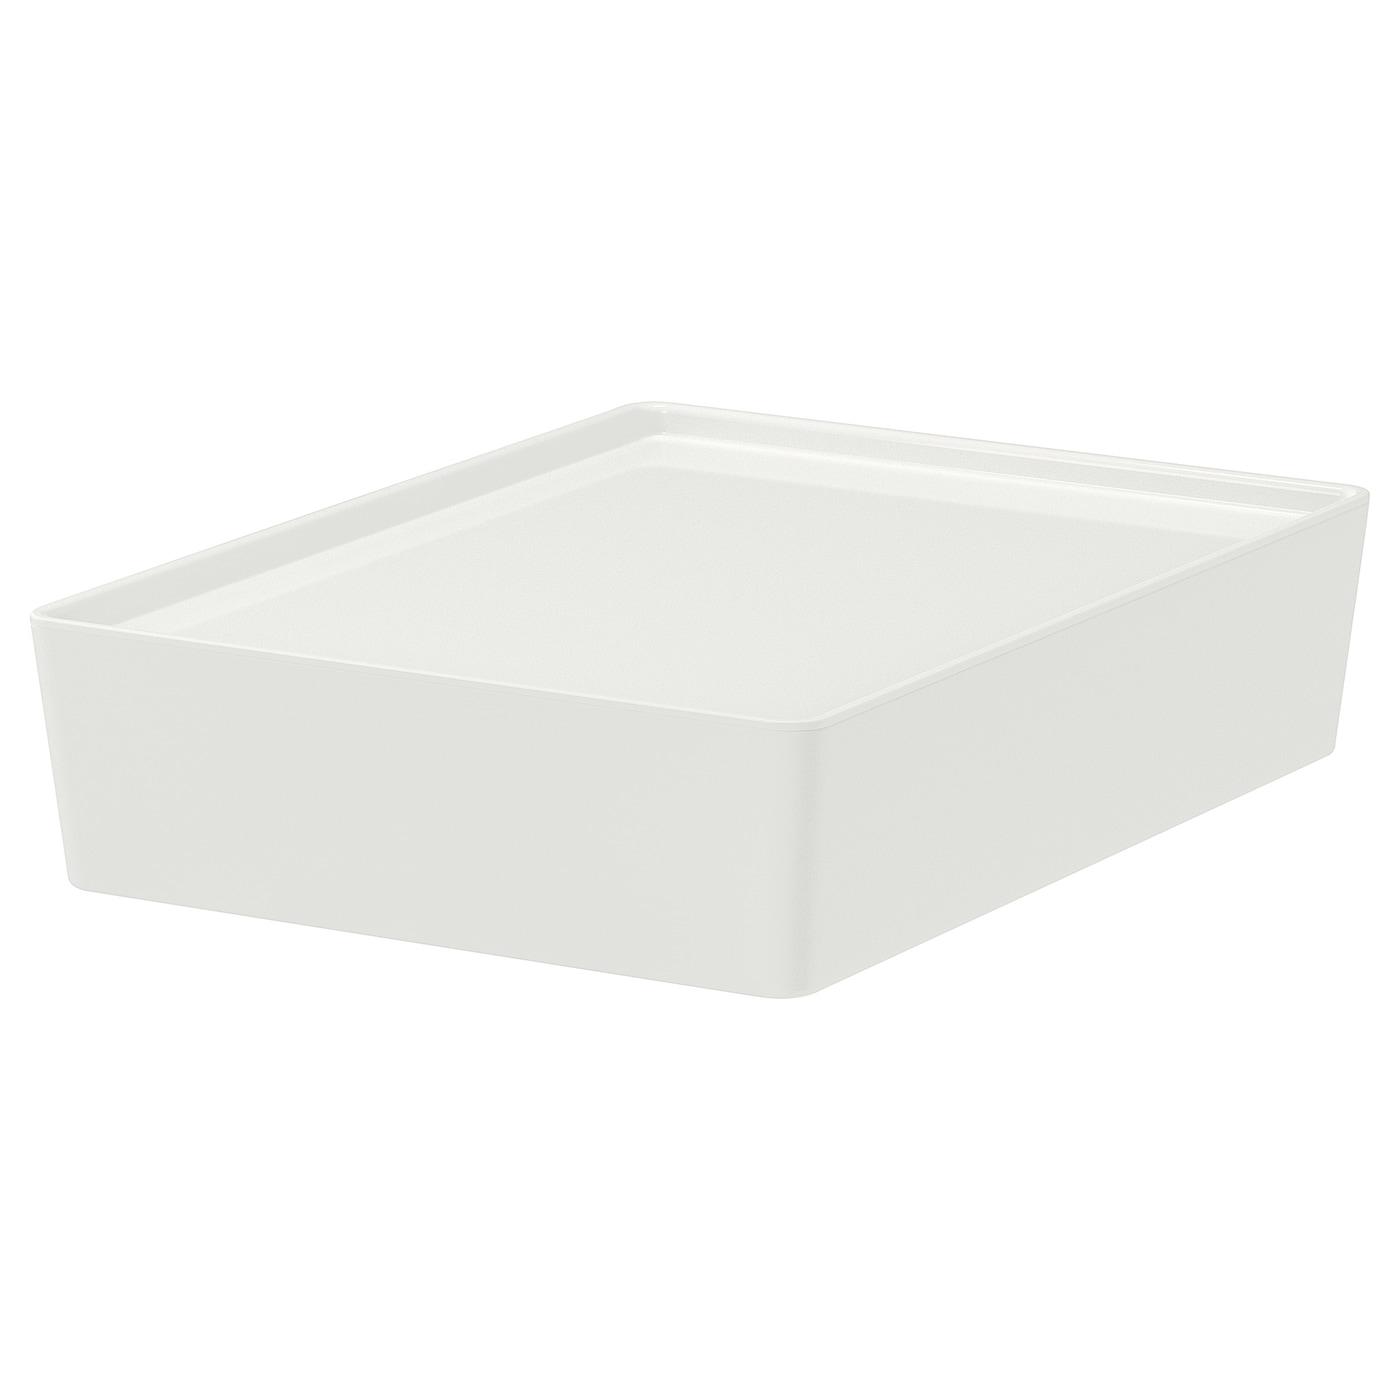 IKEA KUGGIS Box mit Deckel – groß